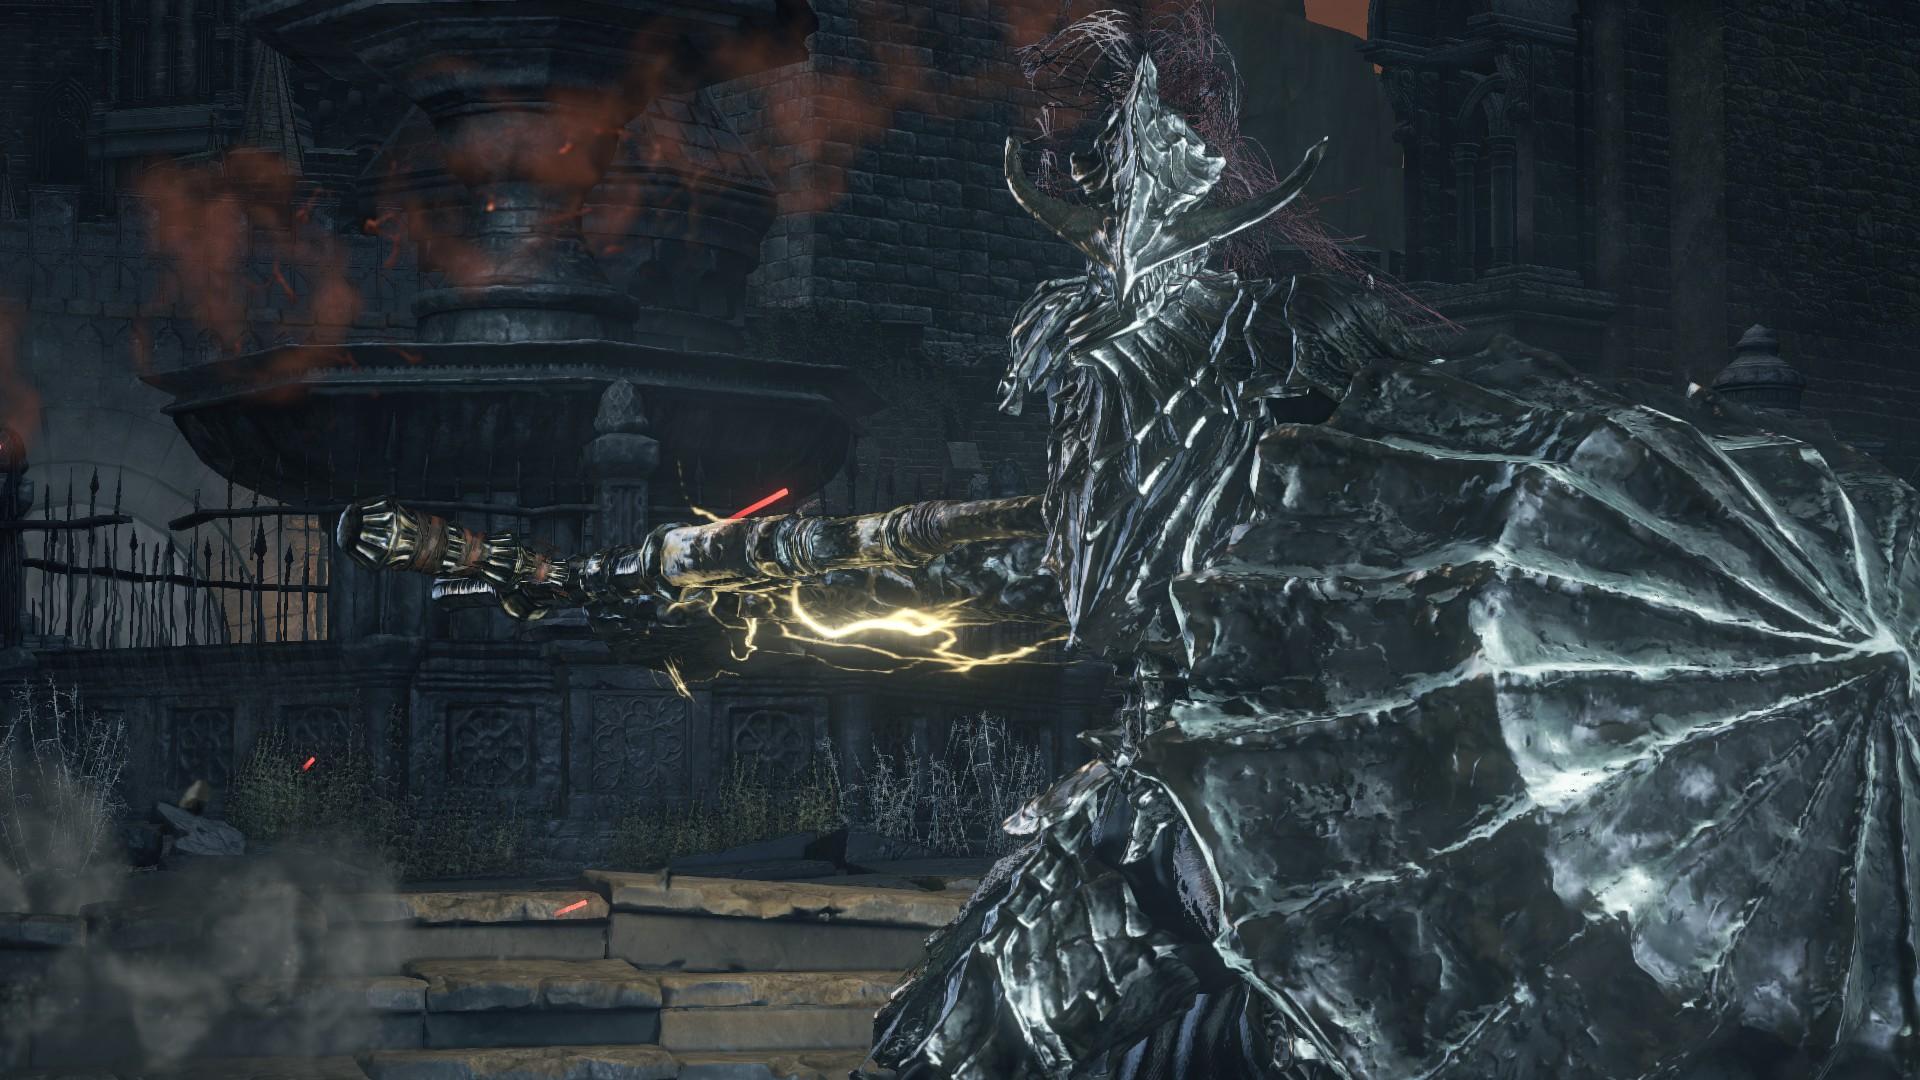 Dark Souls Bosses Ranked Den Of Geek Issei hyoudou in the armor of the red dragon! dark souls bosses ranked den of geek